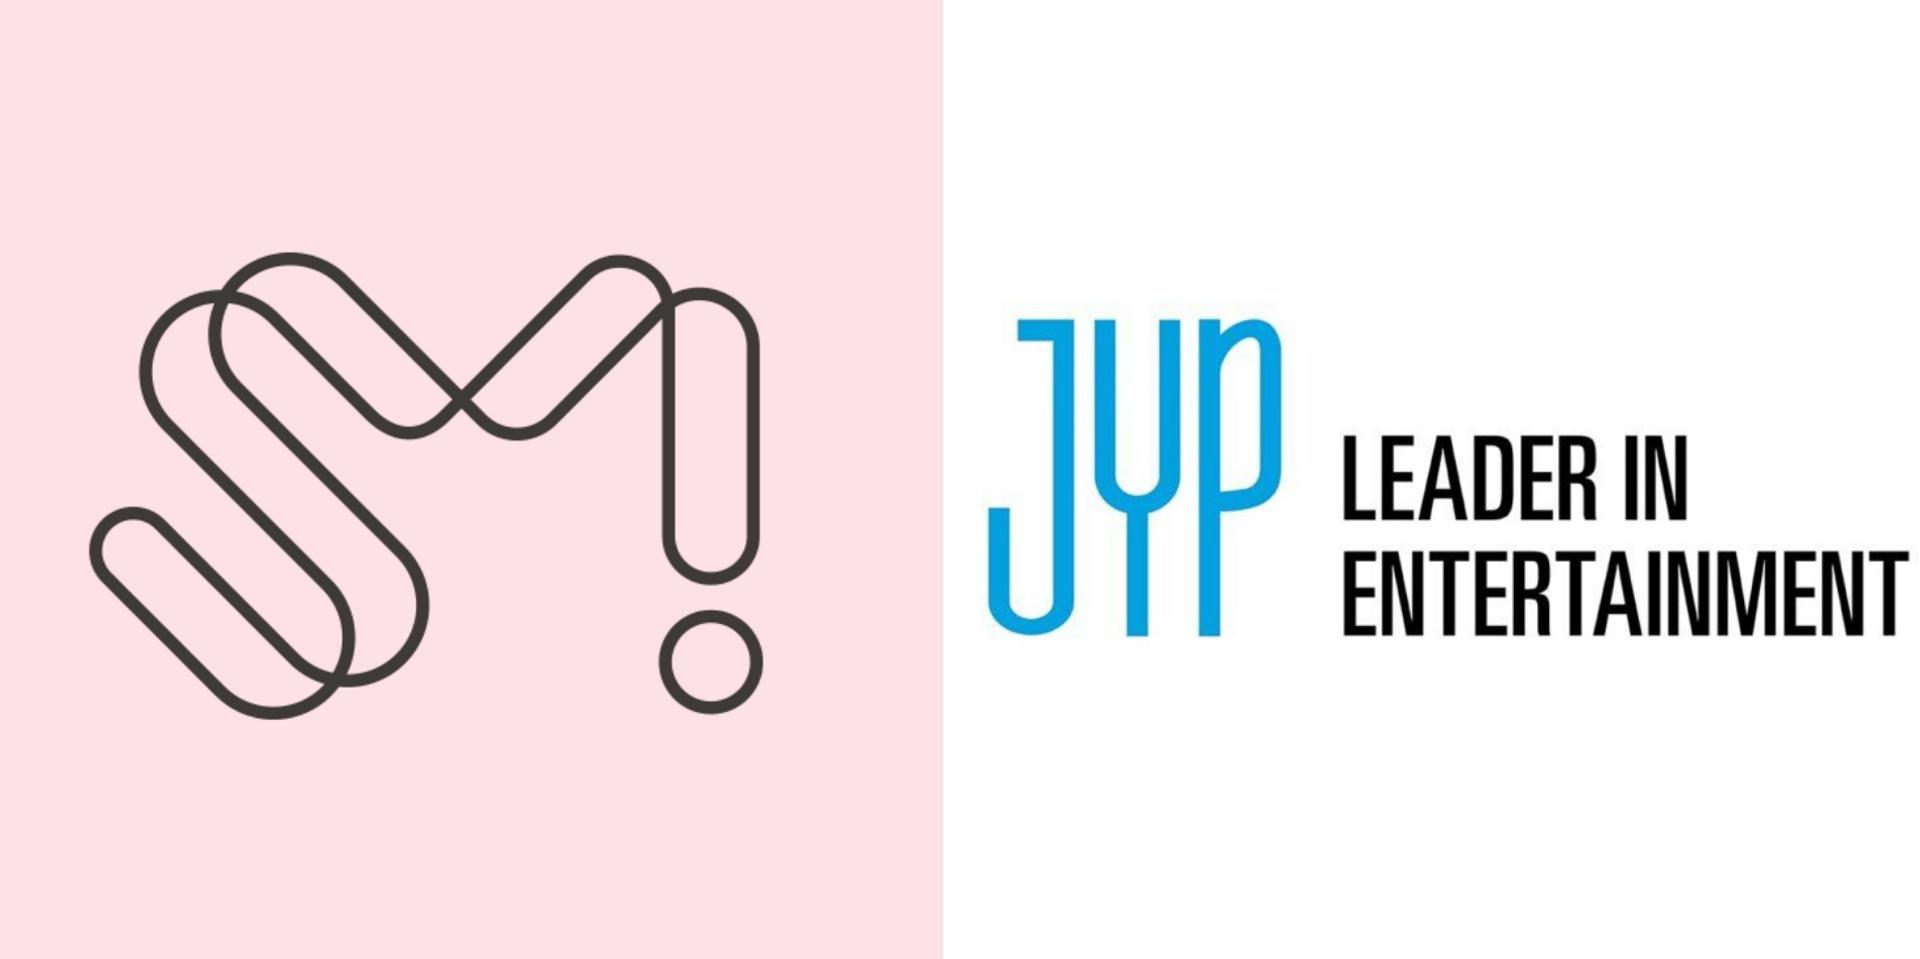 SM Entertainment and JYP Entertainment team up for 'DearU bubble' service